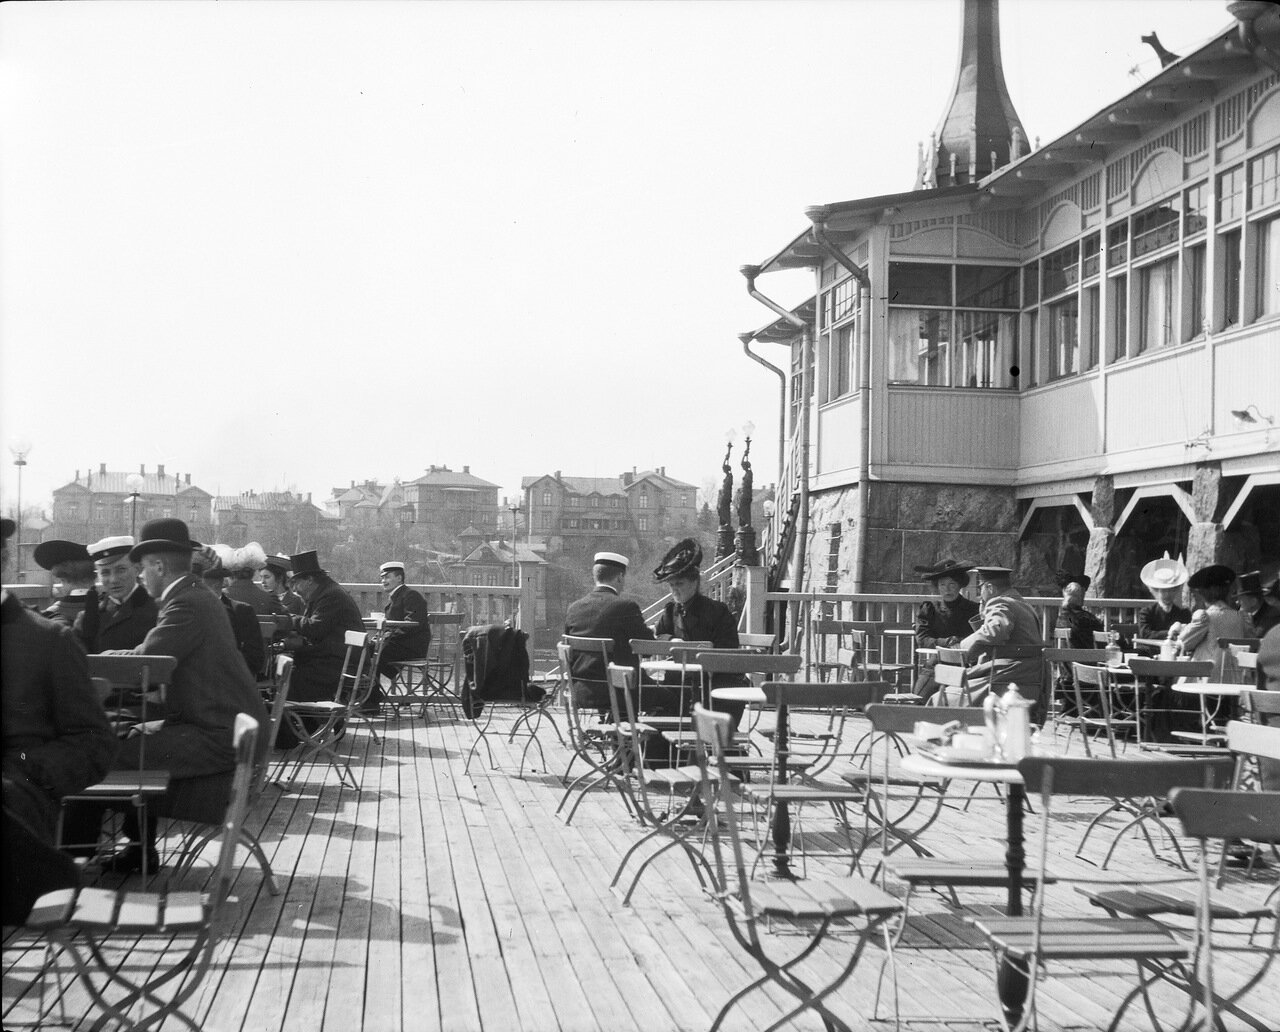 Ресторан Клиппан. 1906